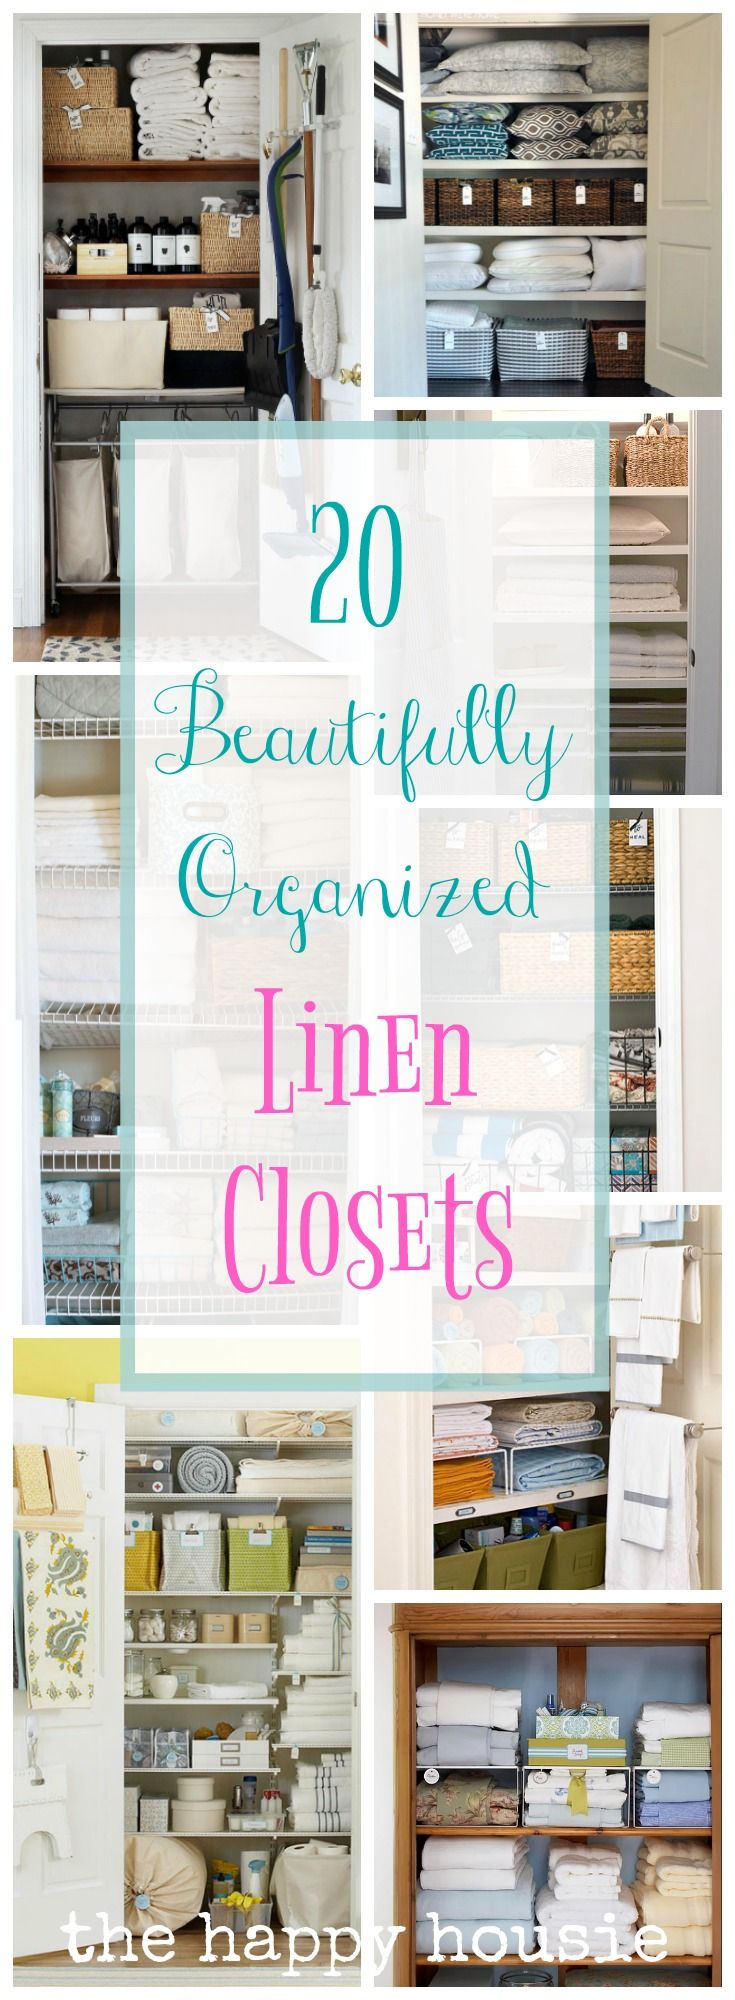 20 Beautifully Organized Linen Closets - I love an organized linen closet, it just makes me happy!